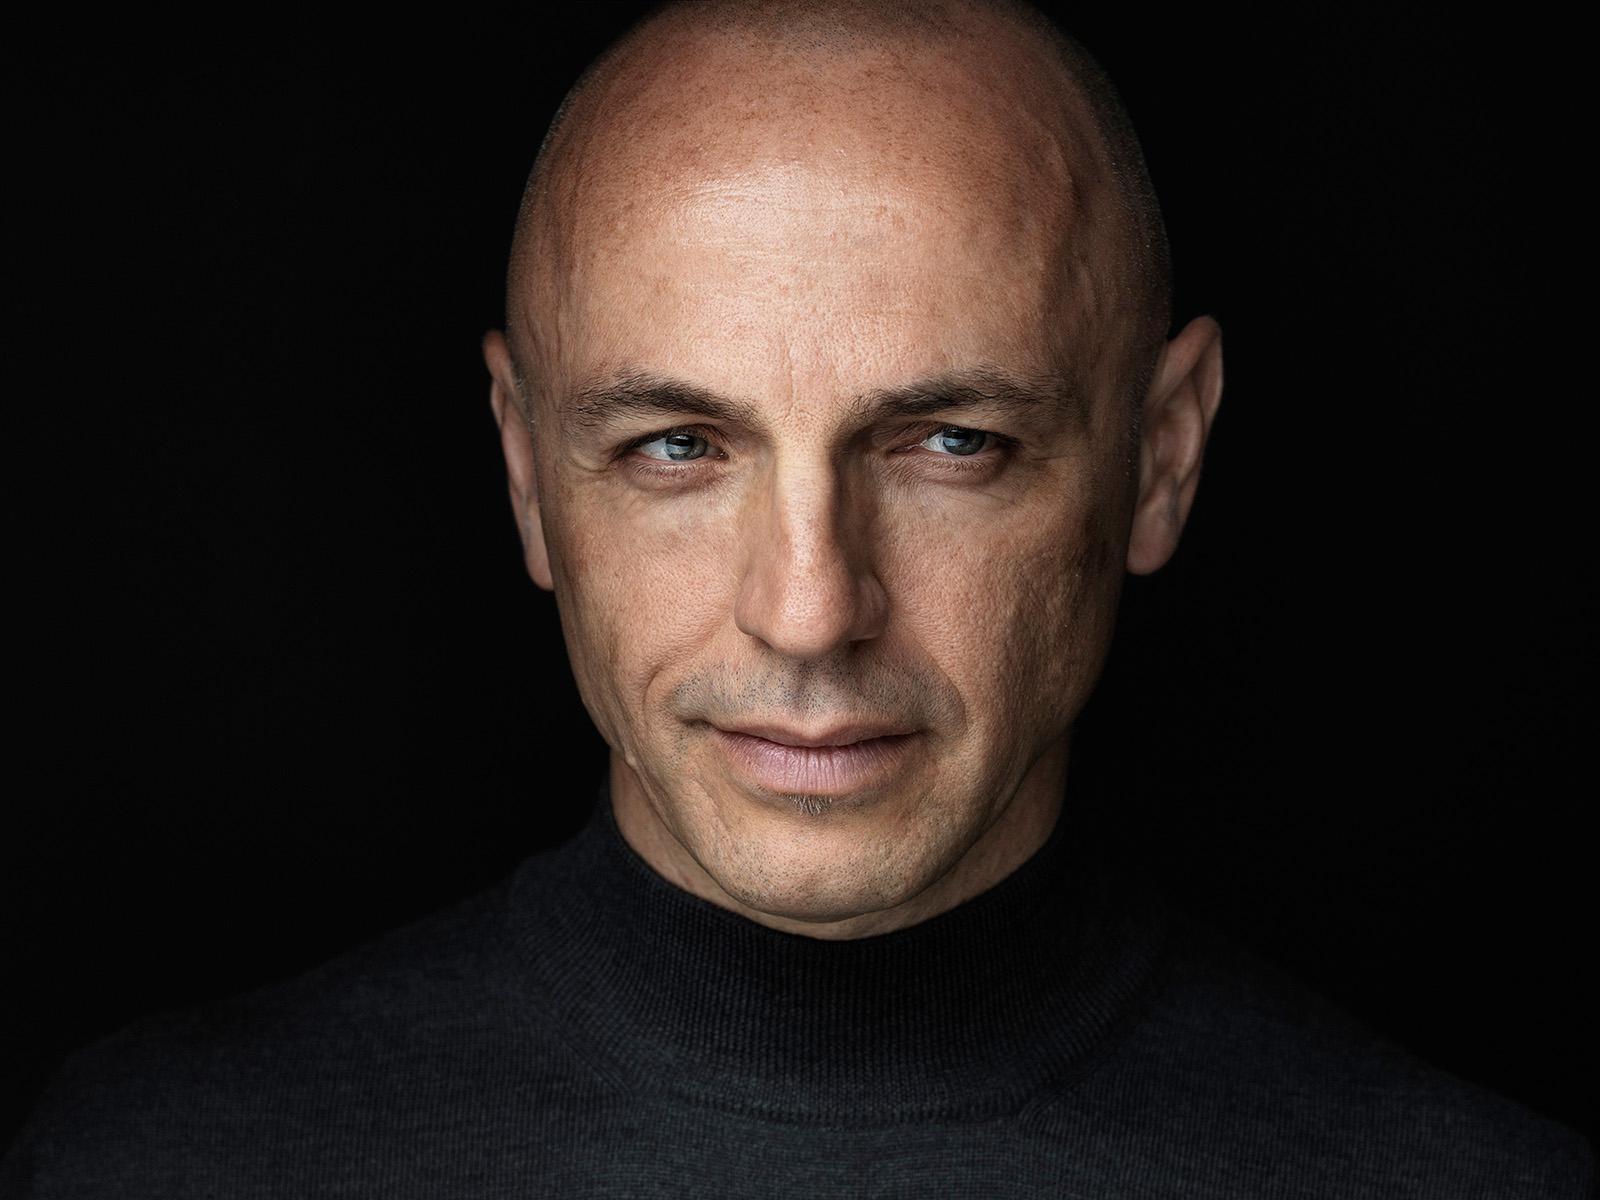 Montreal Portrait and Headshot Photographer Vadim Daniel